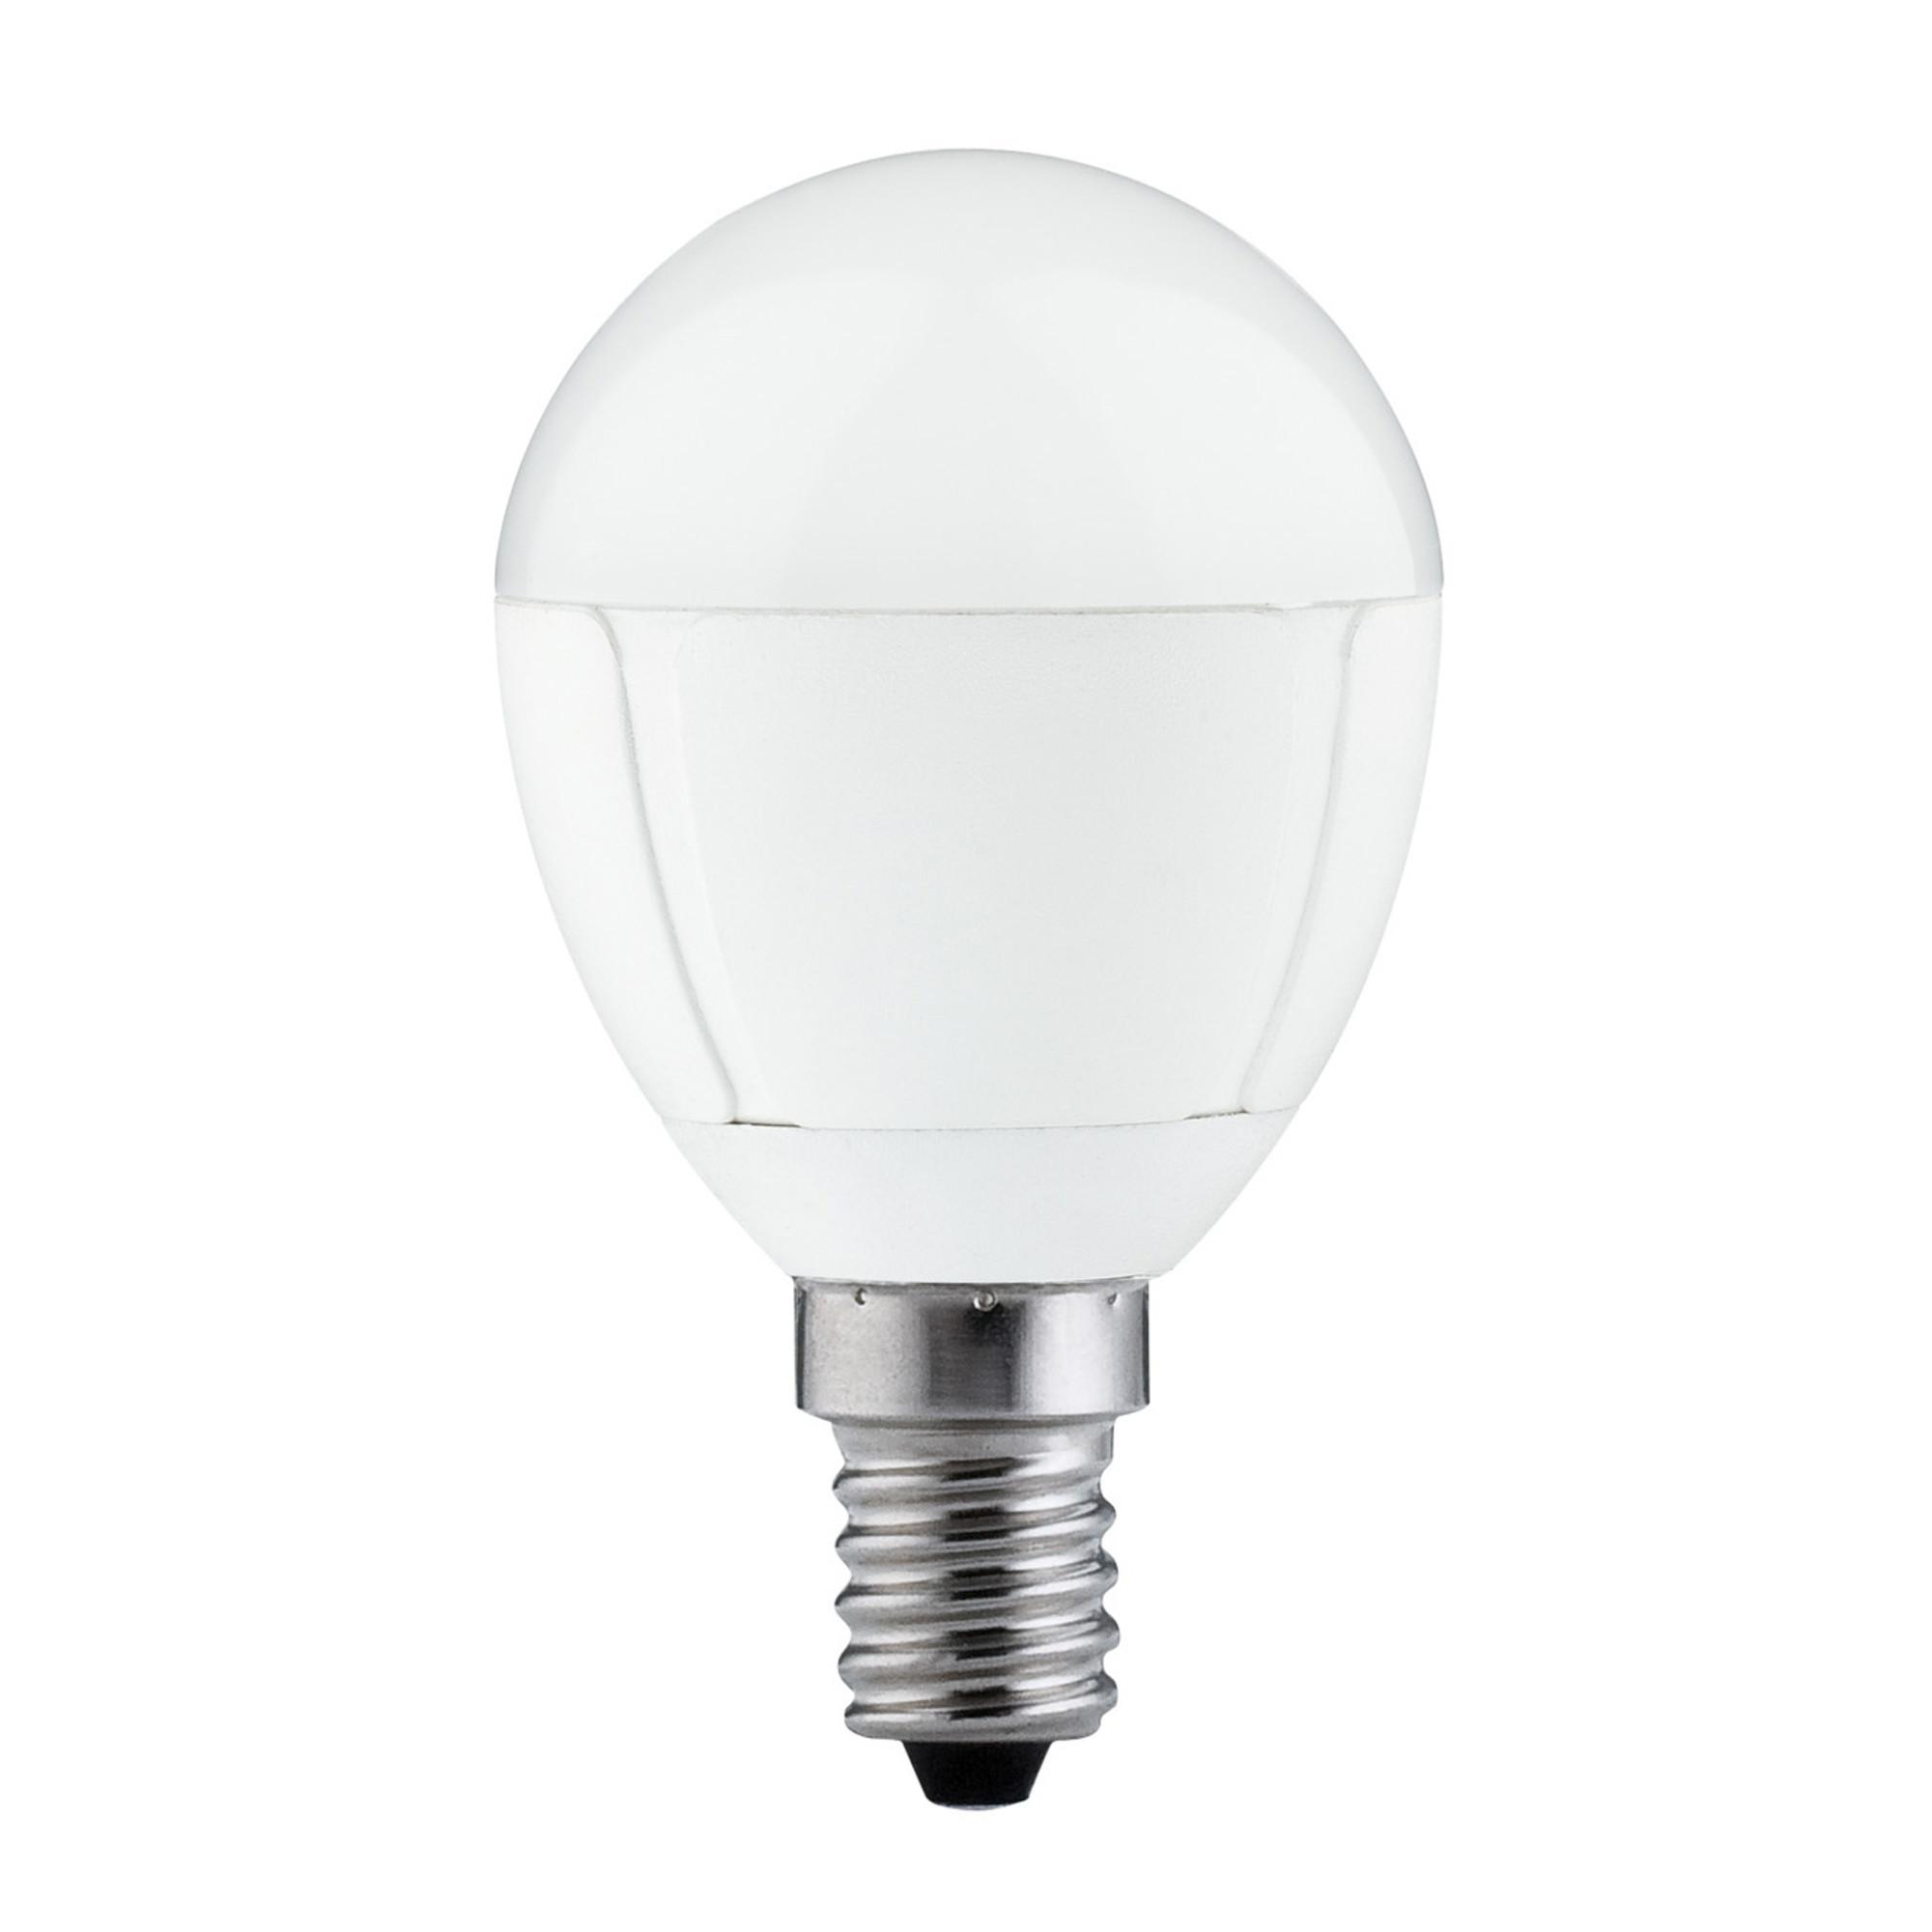 Лампа светодиодная Paulmann 28209 E14 470 Лм теплый свет